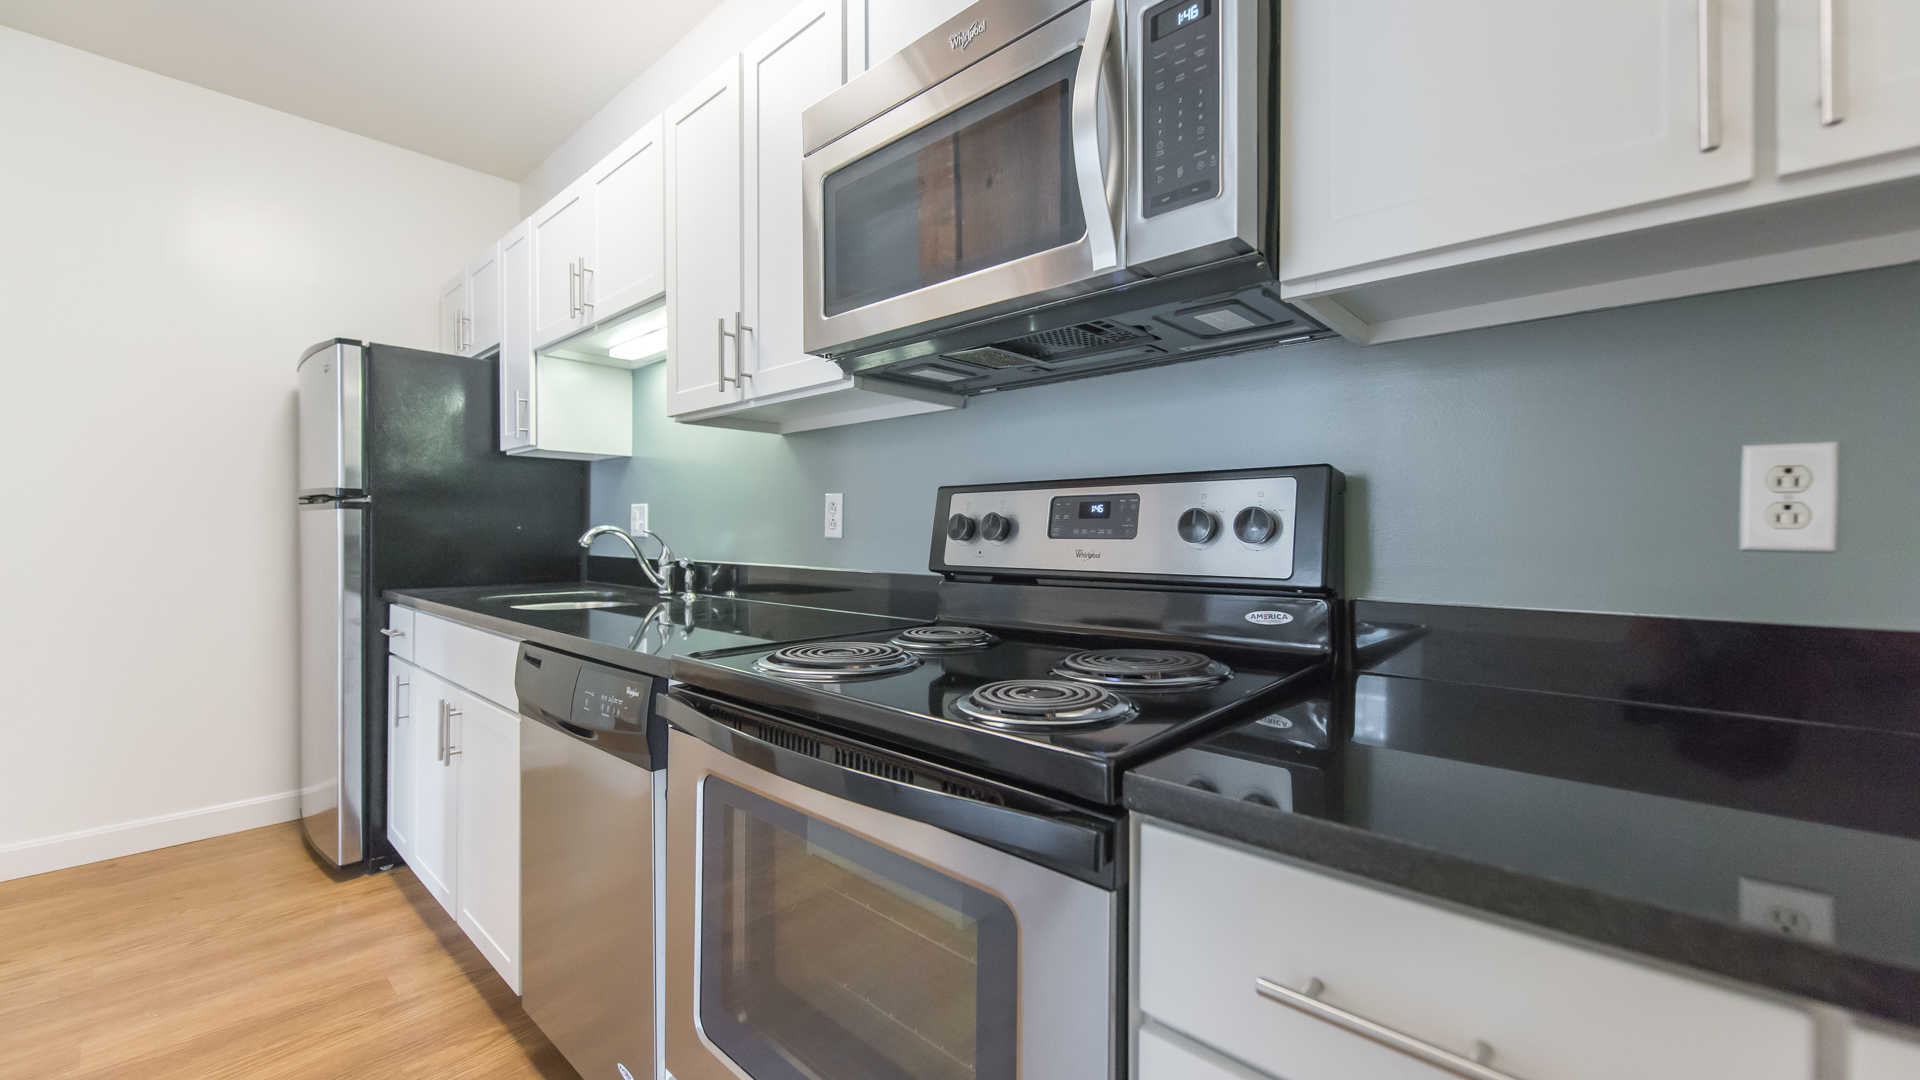 Lofts at kendall square apartments kitchen